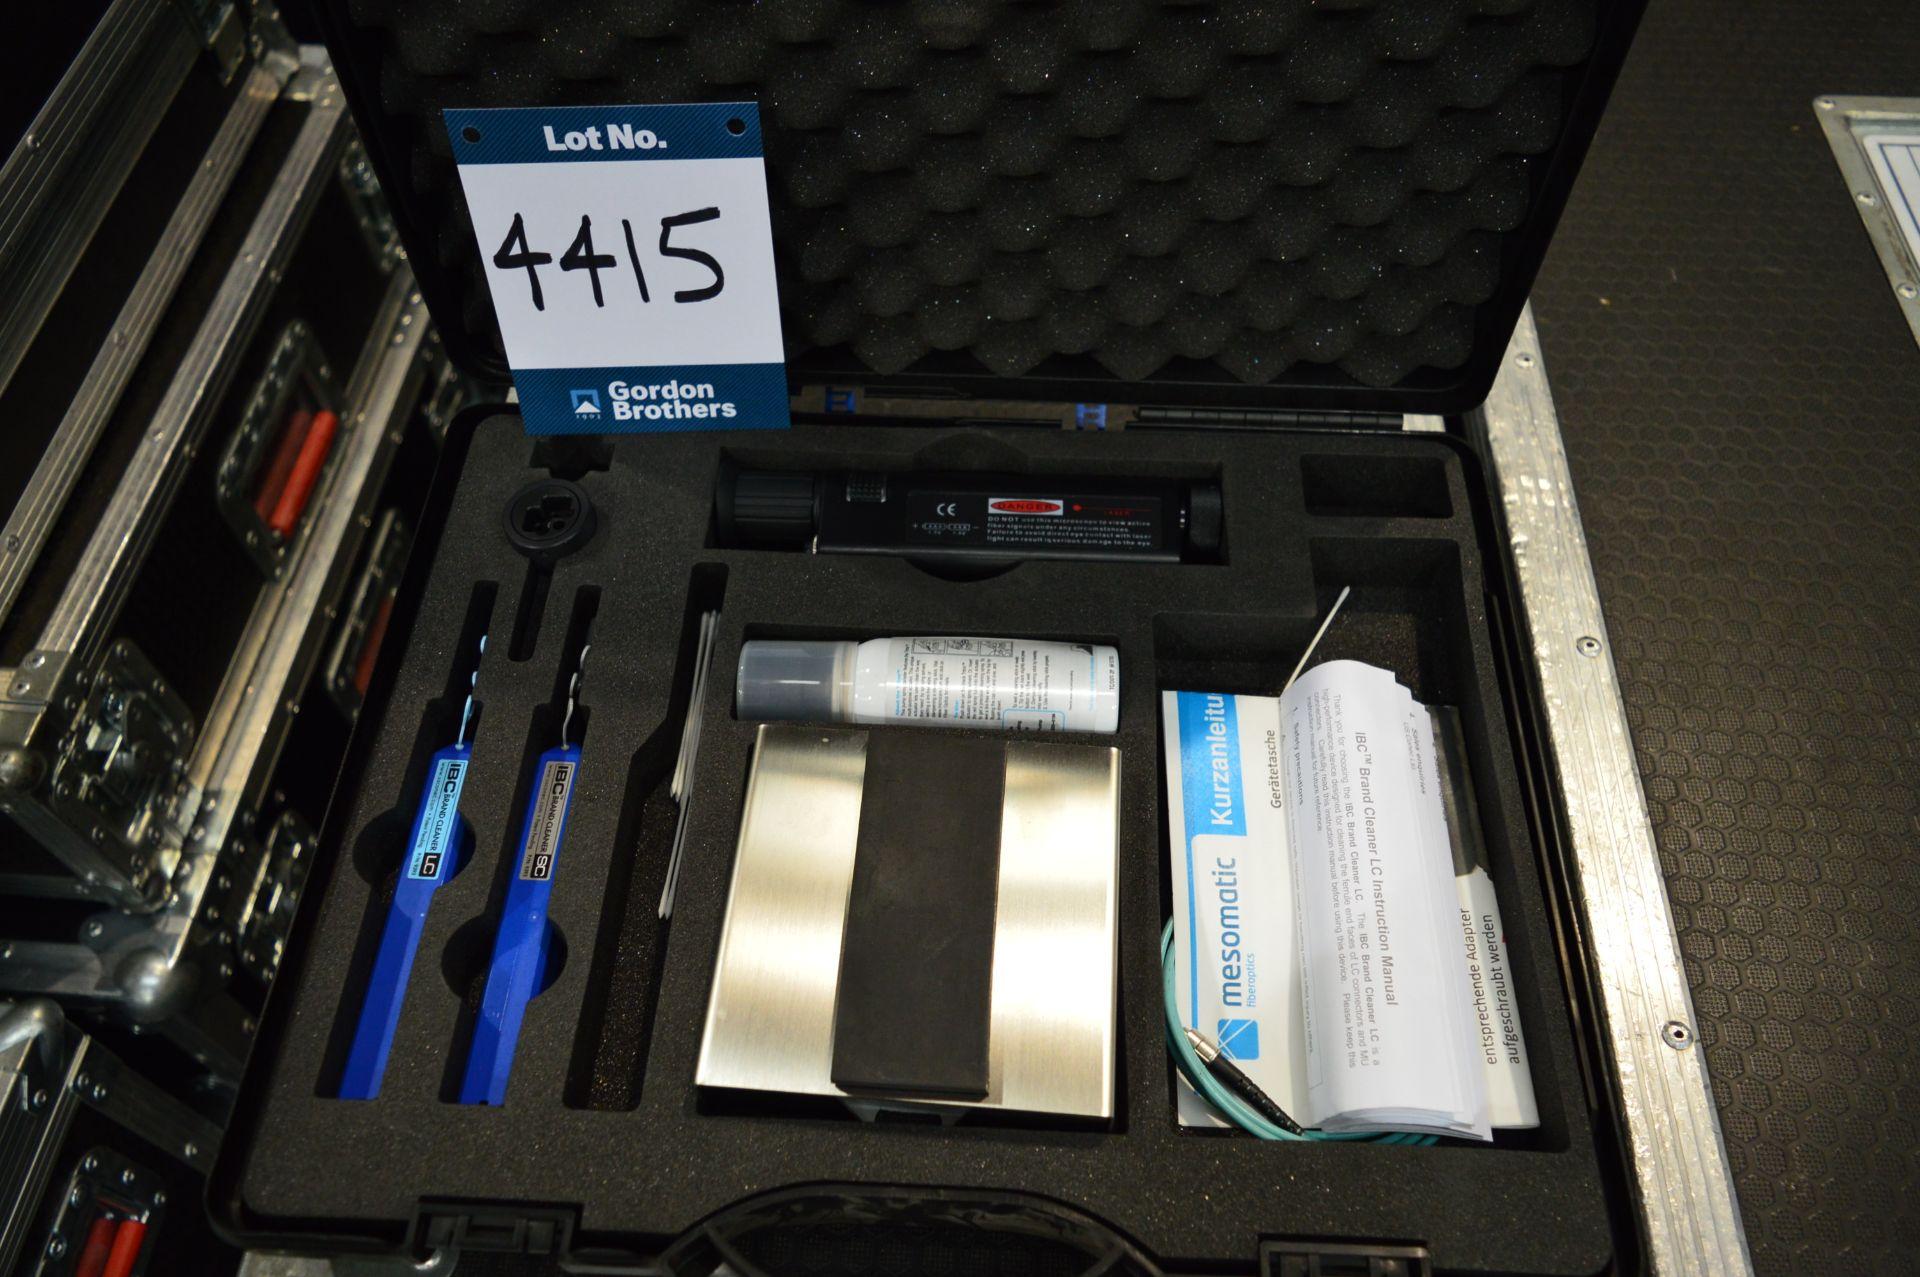 Lot 4415 - Neutrik opticalCON laser mini fibre microscope and cleaning kit in case: Unit 500, Eckersall Road,